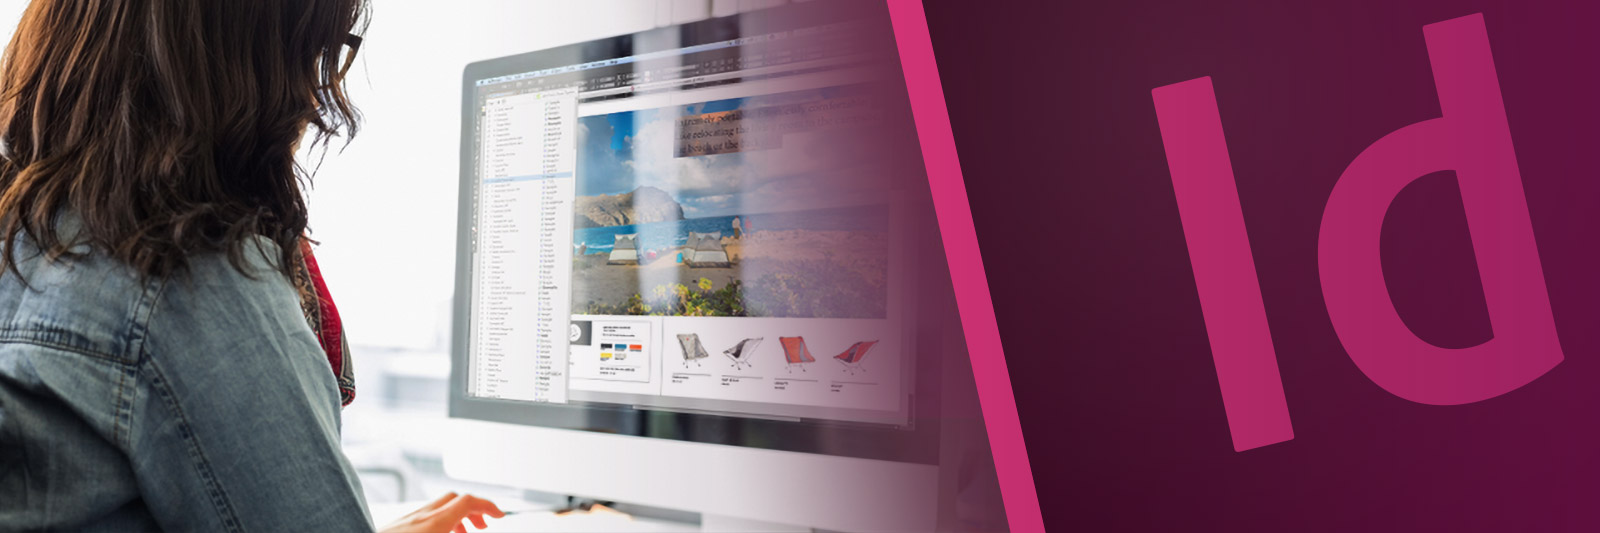 Adobe InDesign Course